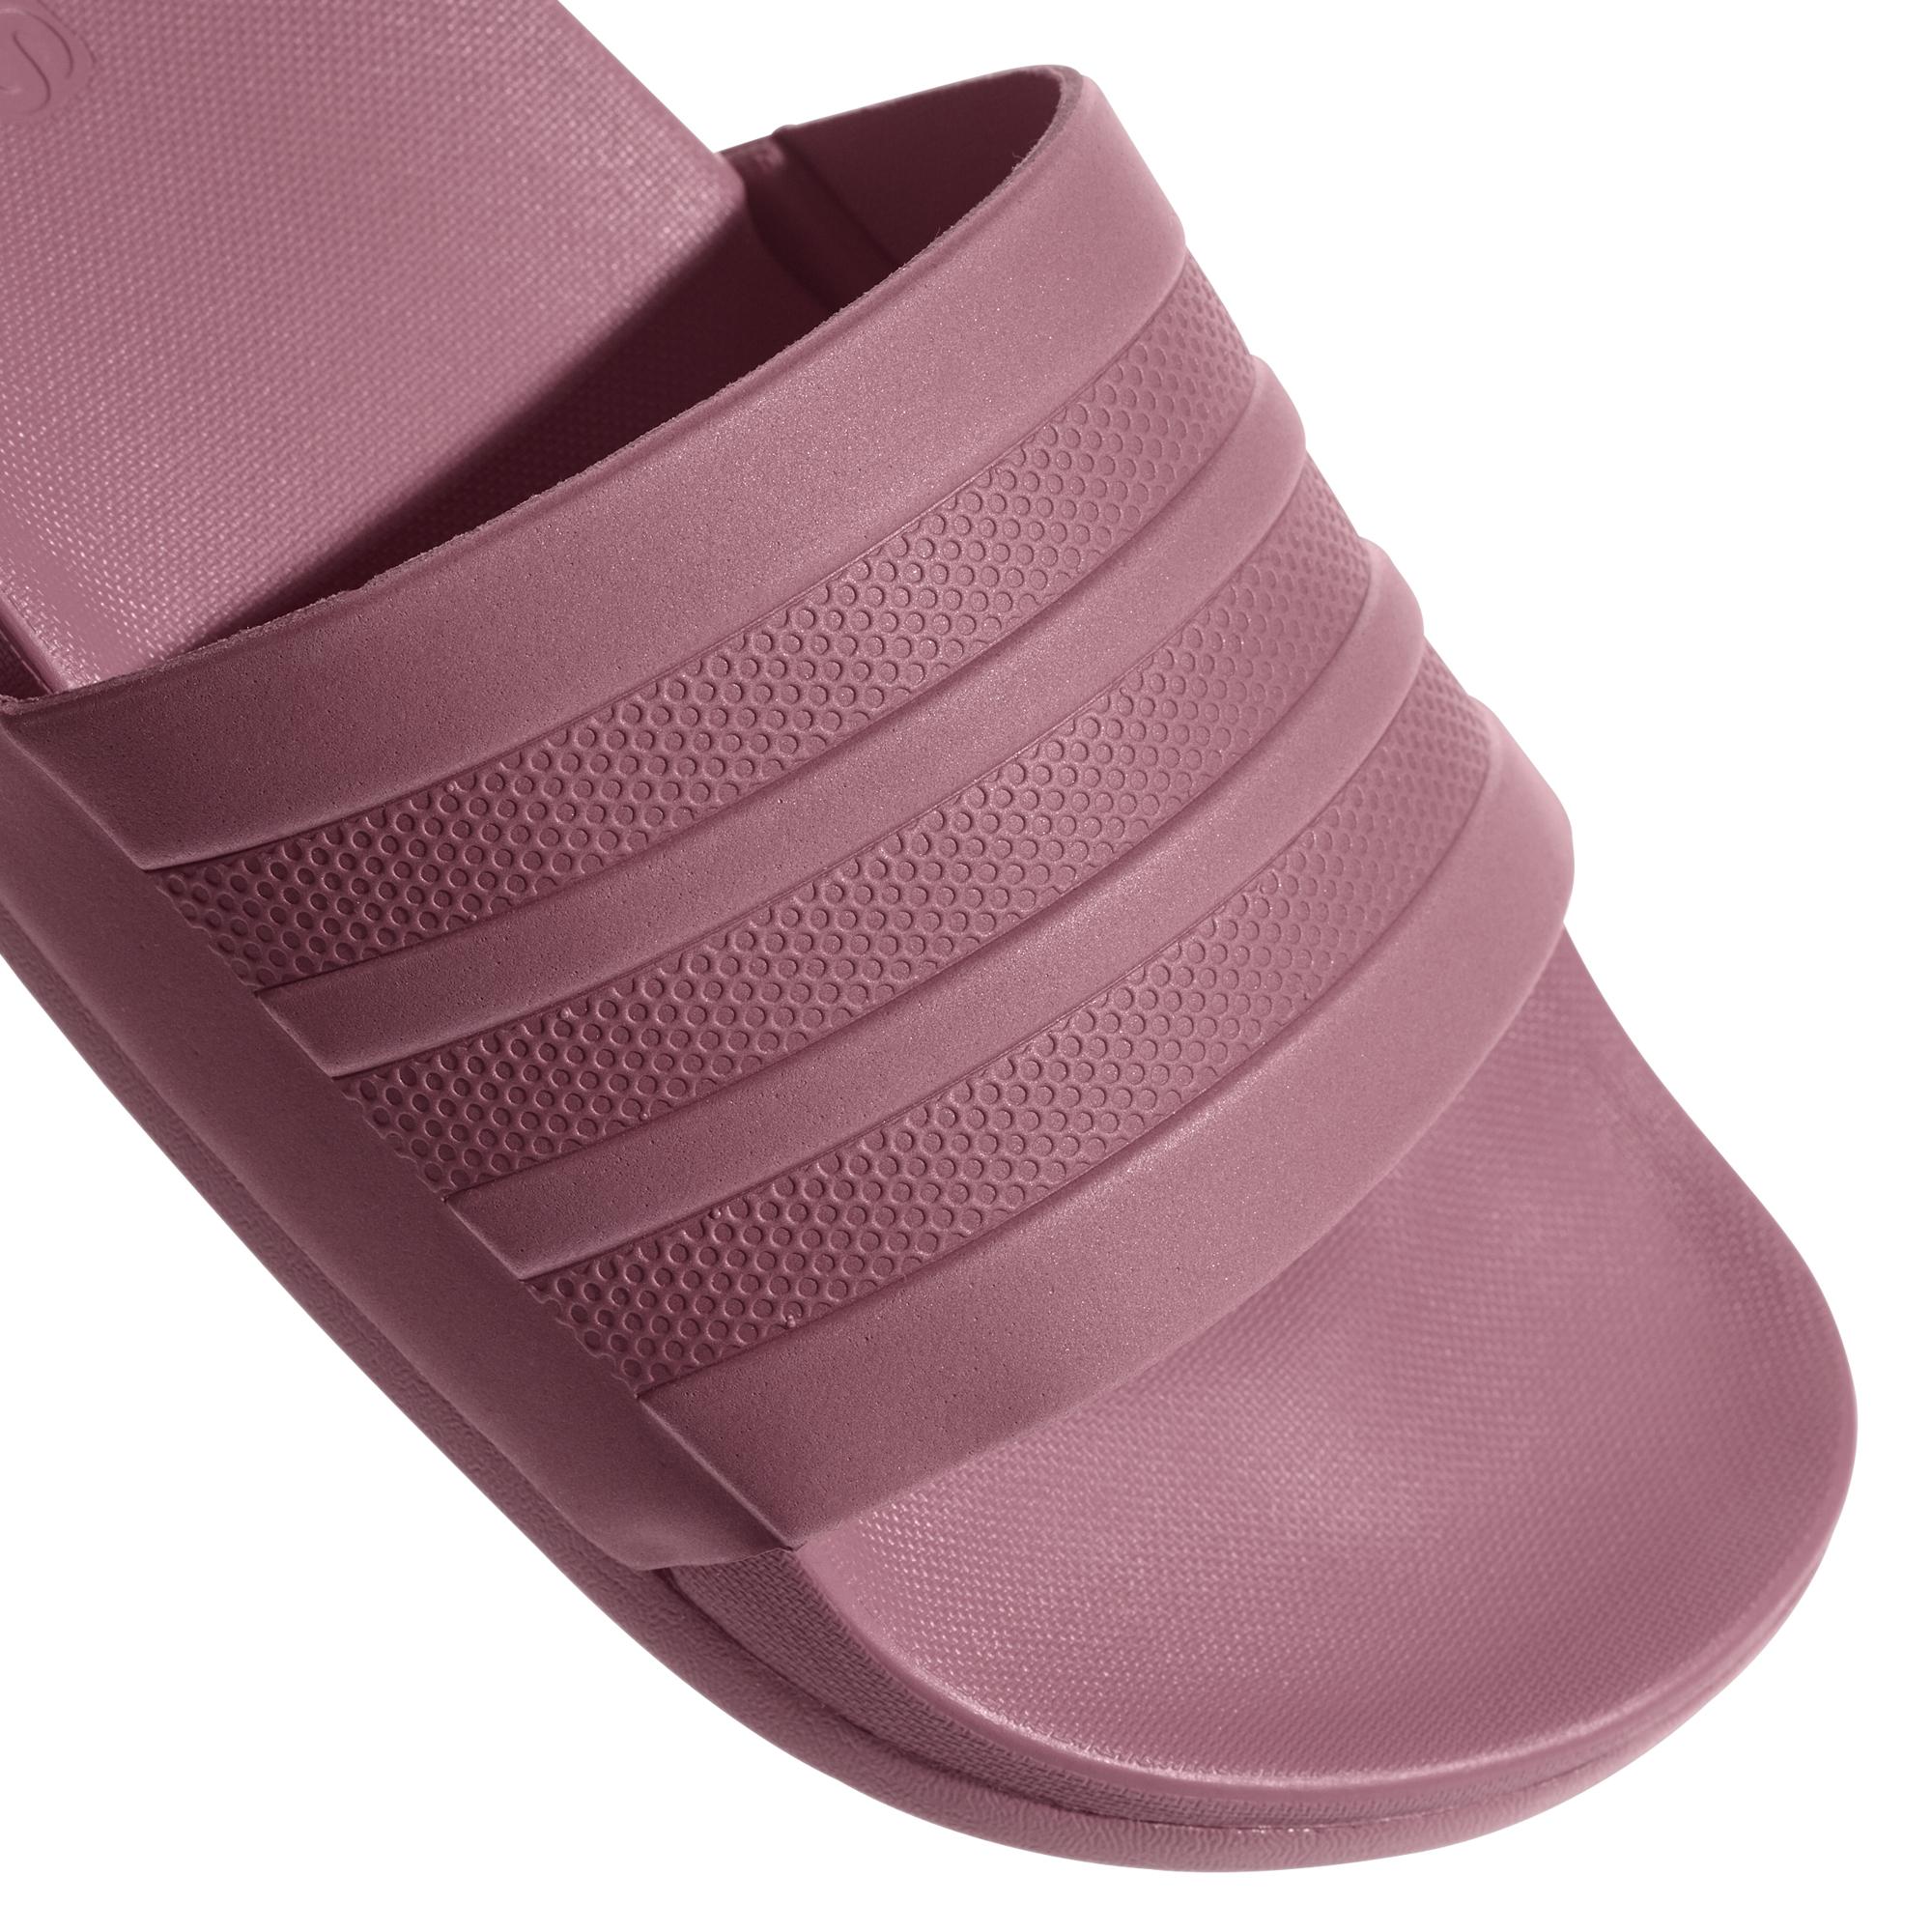 info for 767bd fae77 Adidas Adilette Cloudfoam Plus Mono Slipper Damen Badeschuhe 36 23 Trace  Maroon  Trace